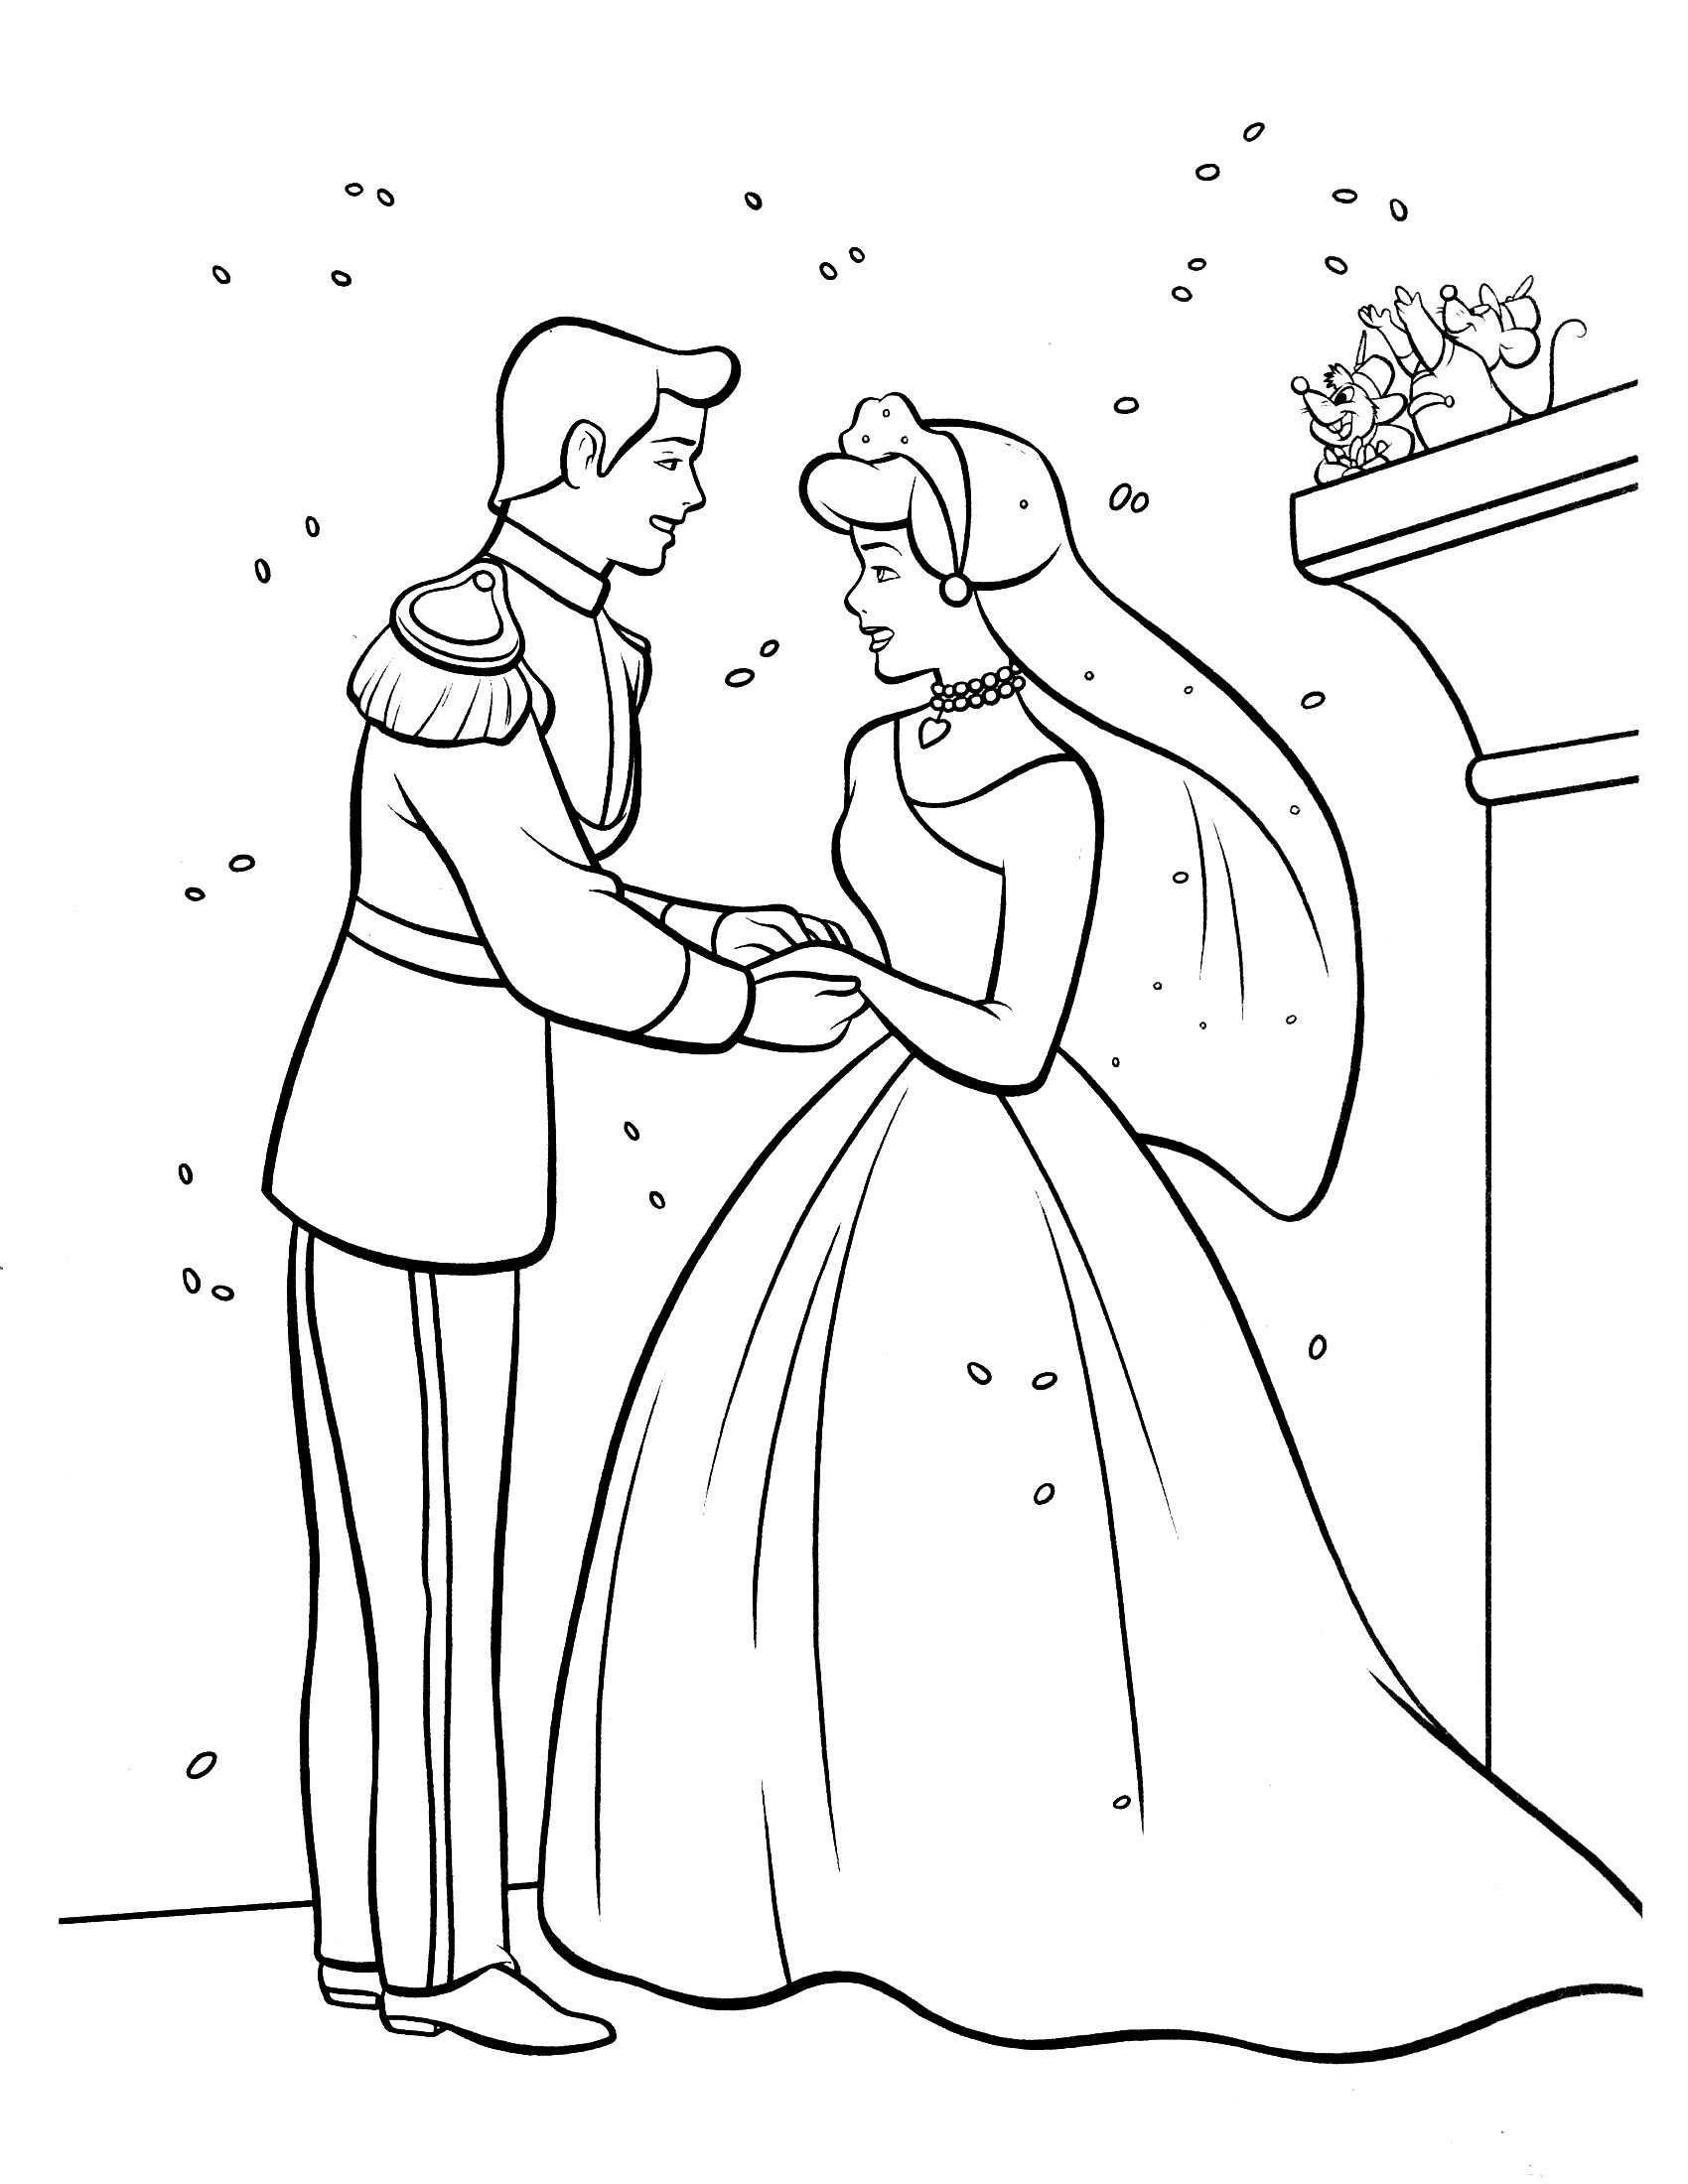 21 Exclusive Photo Of Wedding Coloring Pages Entitlementtrap Com Cinderella Coloring Pages Descendants Coloring Pages Elsa Coloring Pages